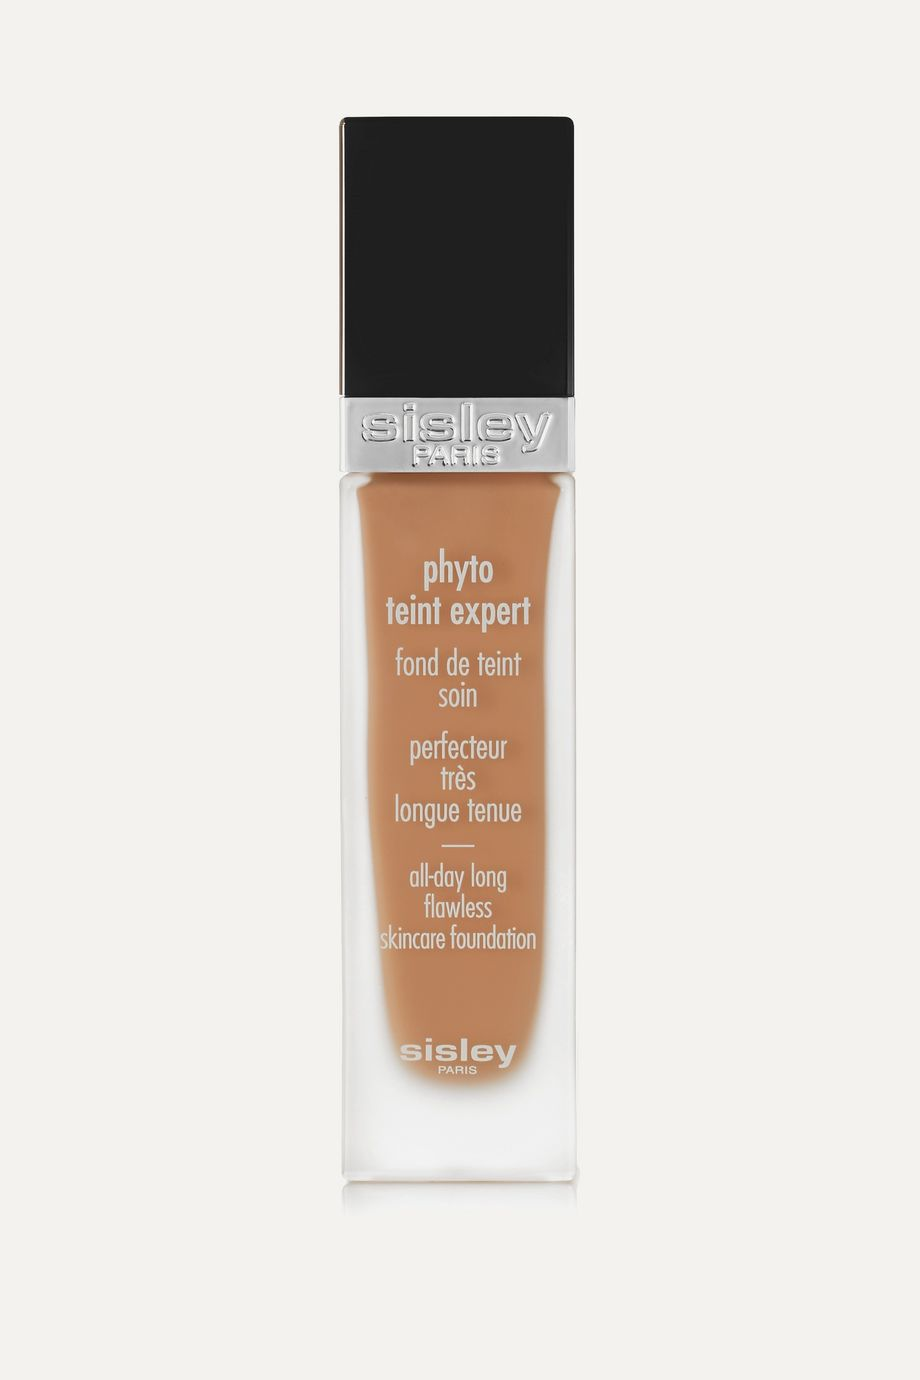 Sisley Phyto-Teint Expert Flawless Skincare Foundation - 4 Honey, 30ml